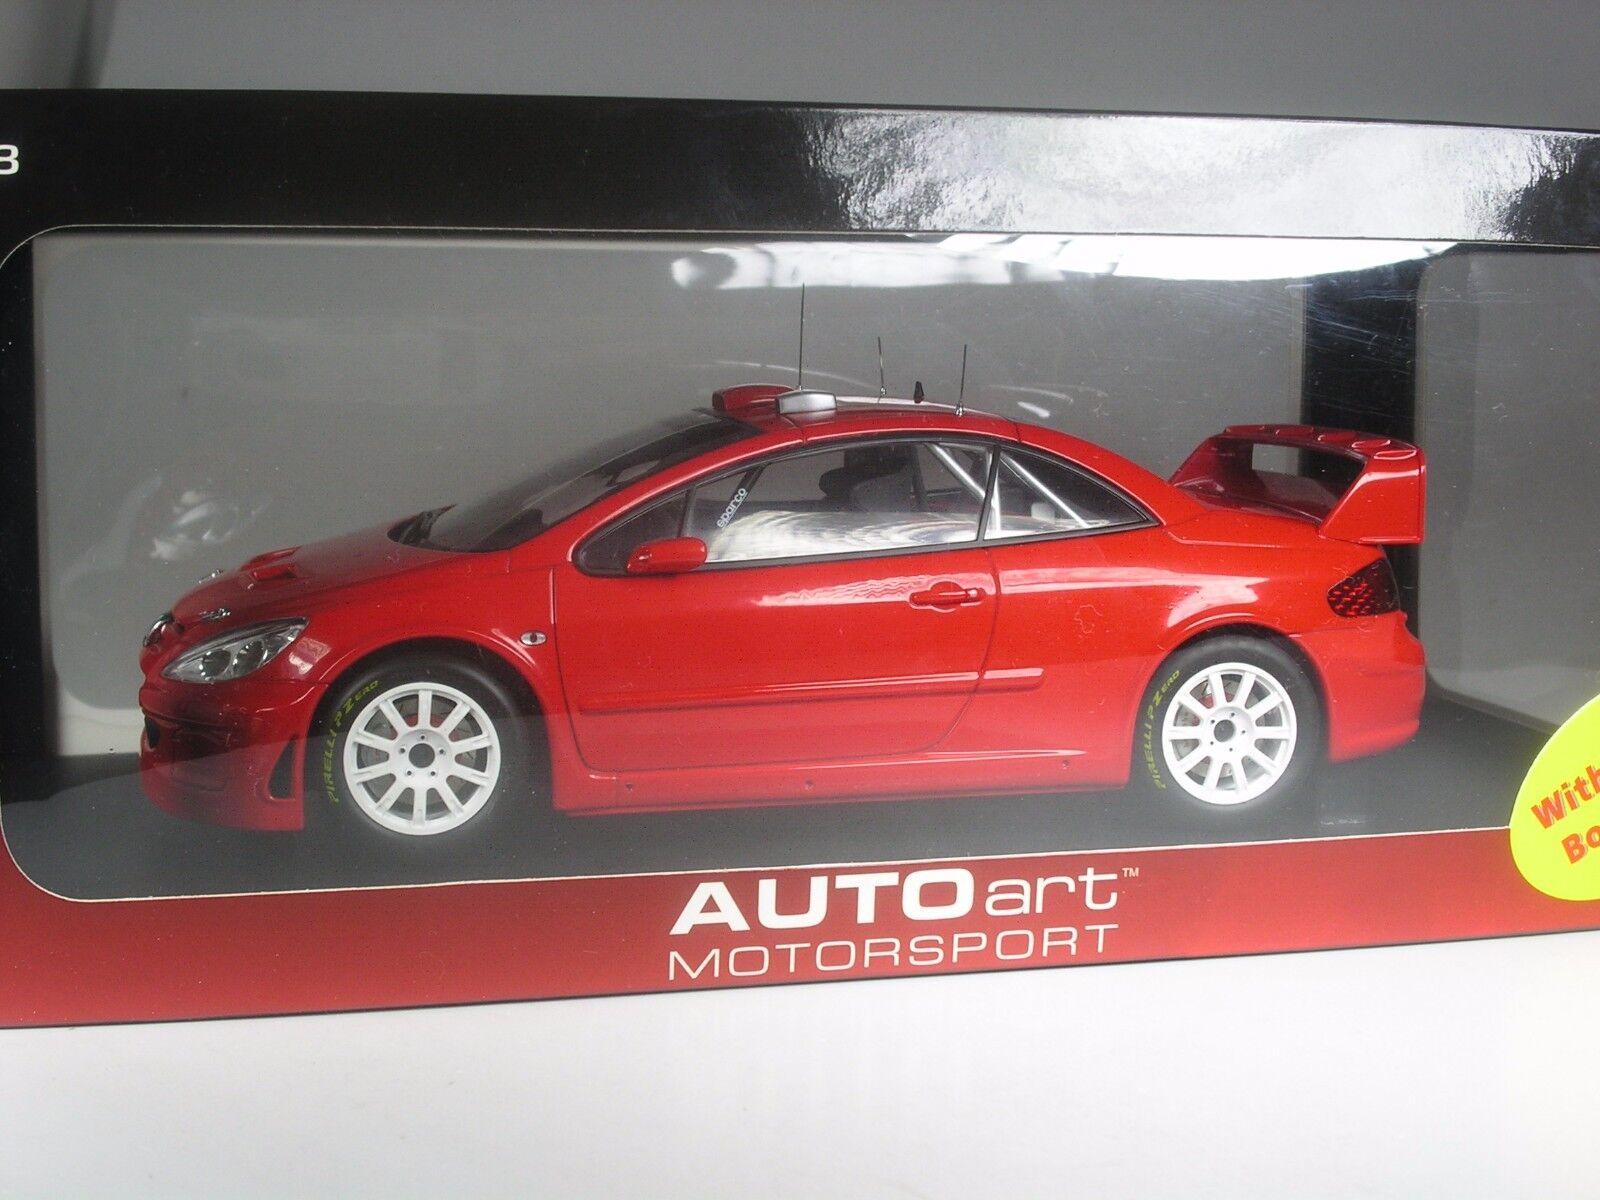 Autoart Peugeot 307 Coupé rot in 1 18 in OVP